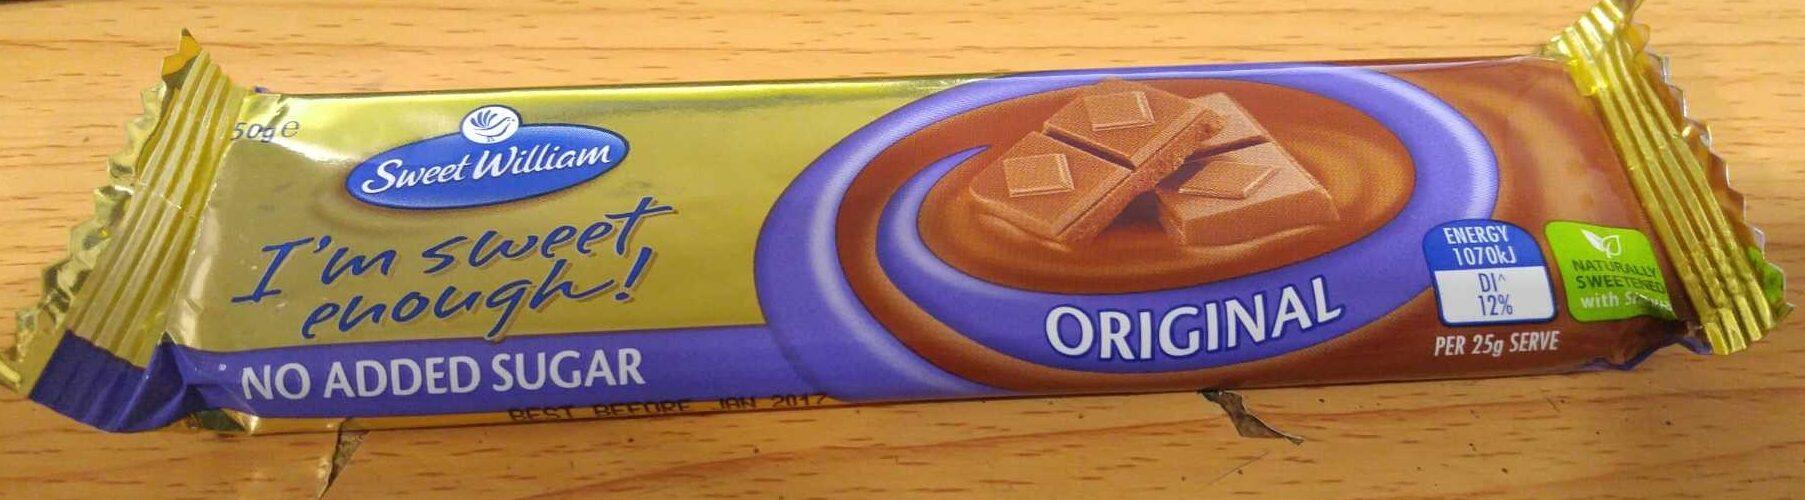 Sweet William Original - Product - en